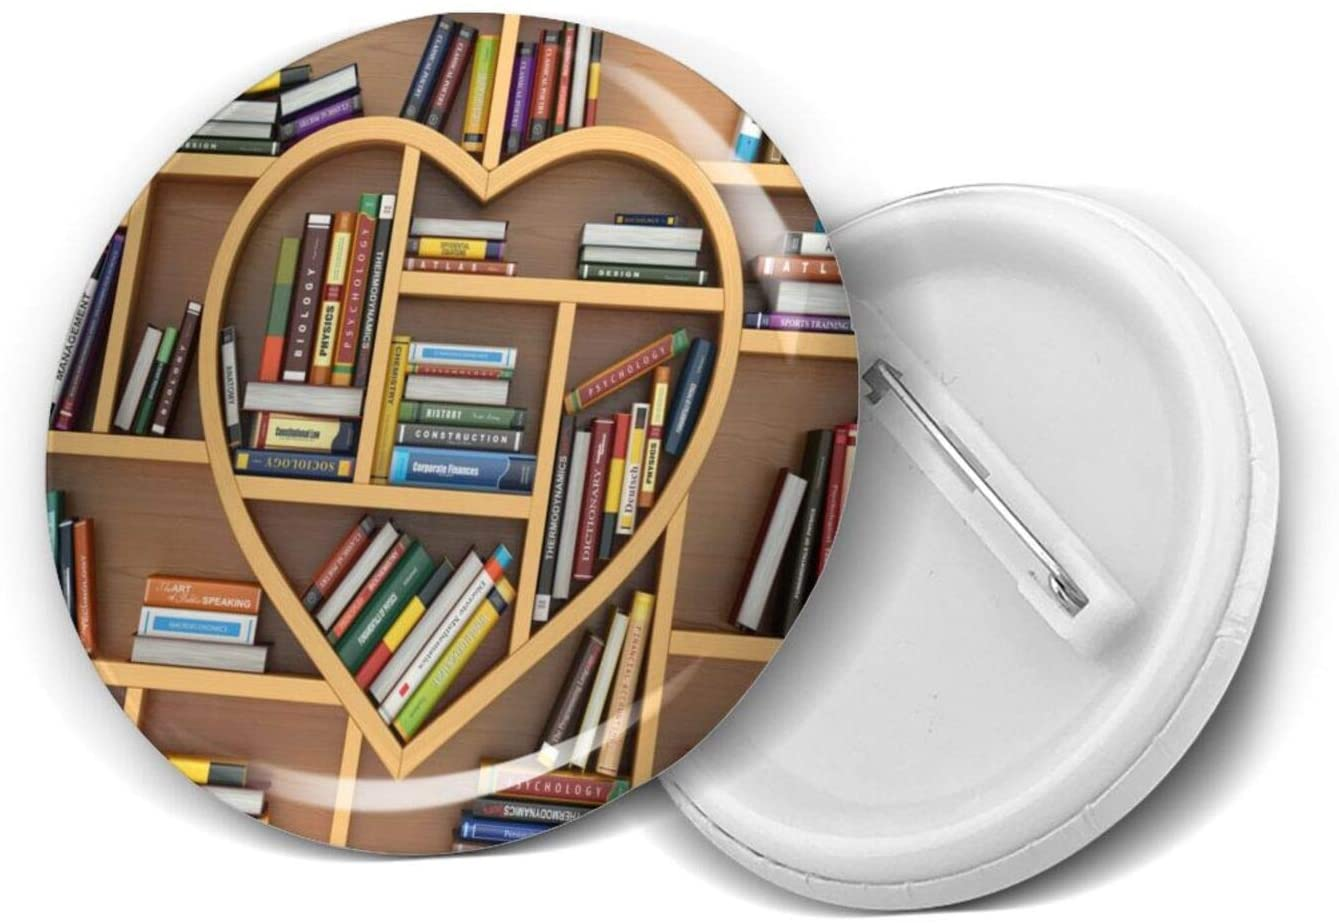 Library Heart-Shaped Bookshelf Round Circle Badge Personality Pin Buckle Logo